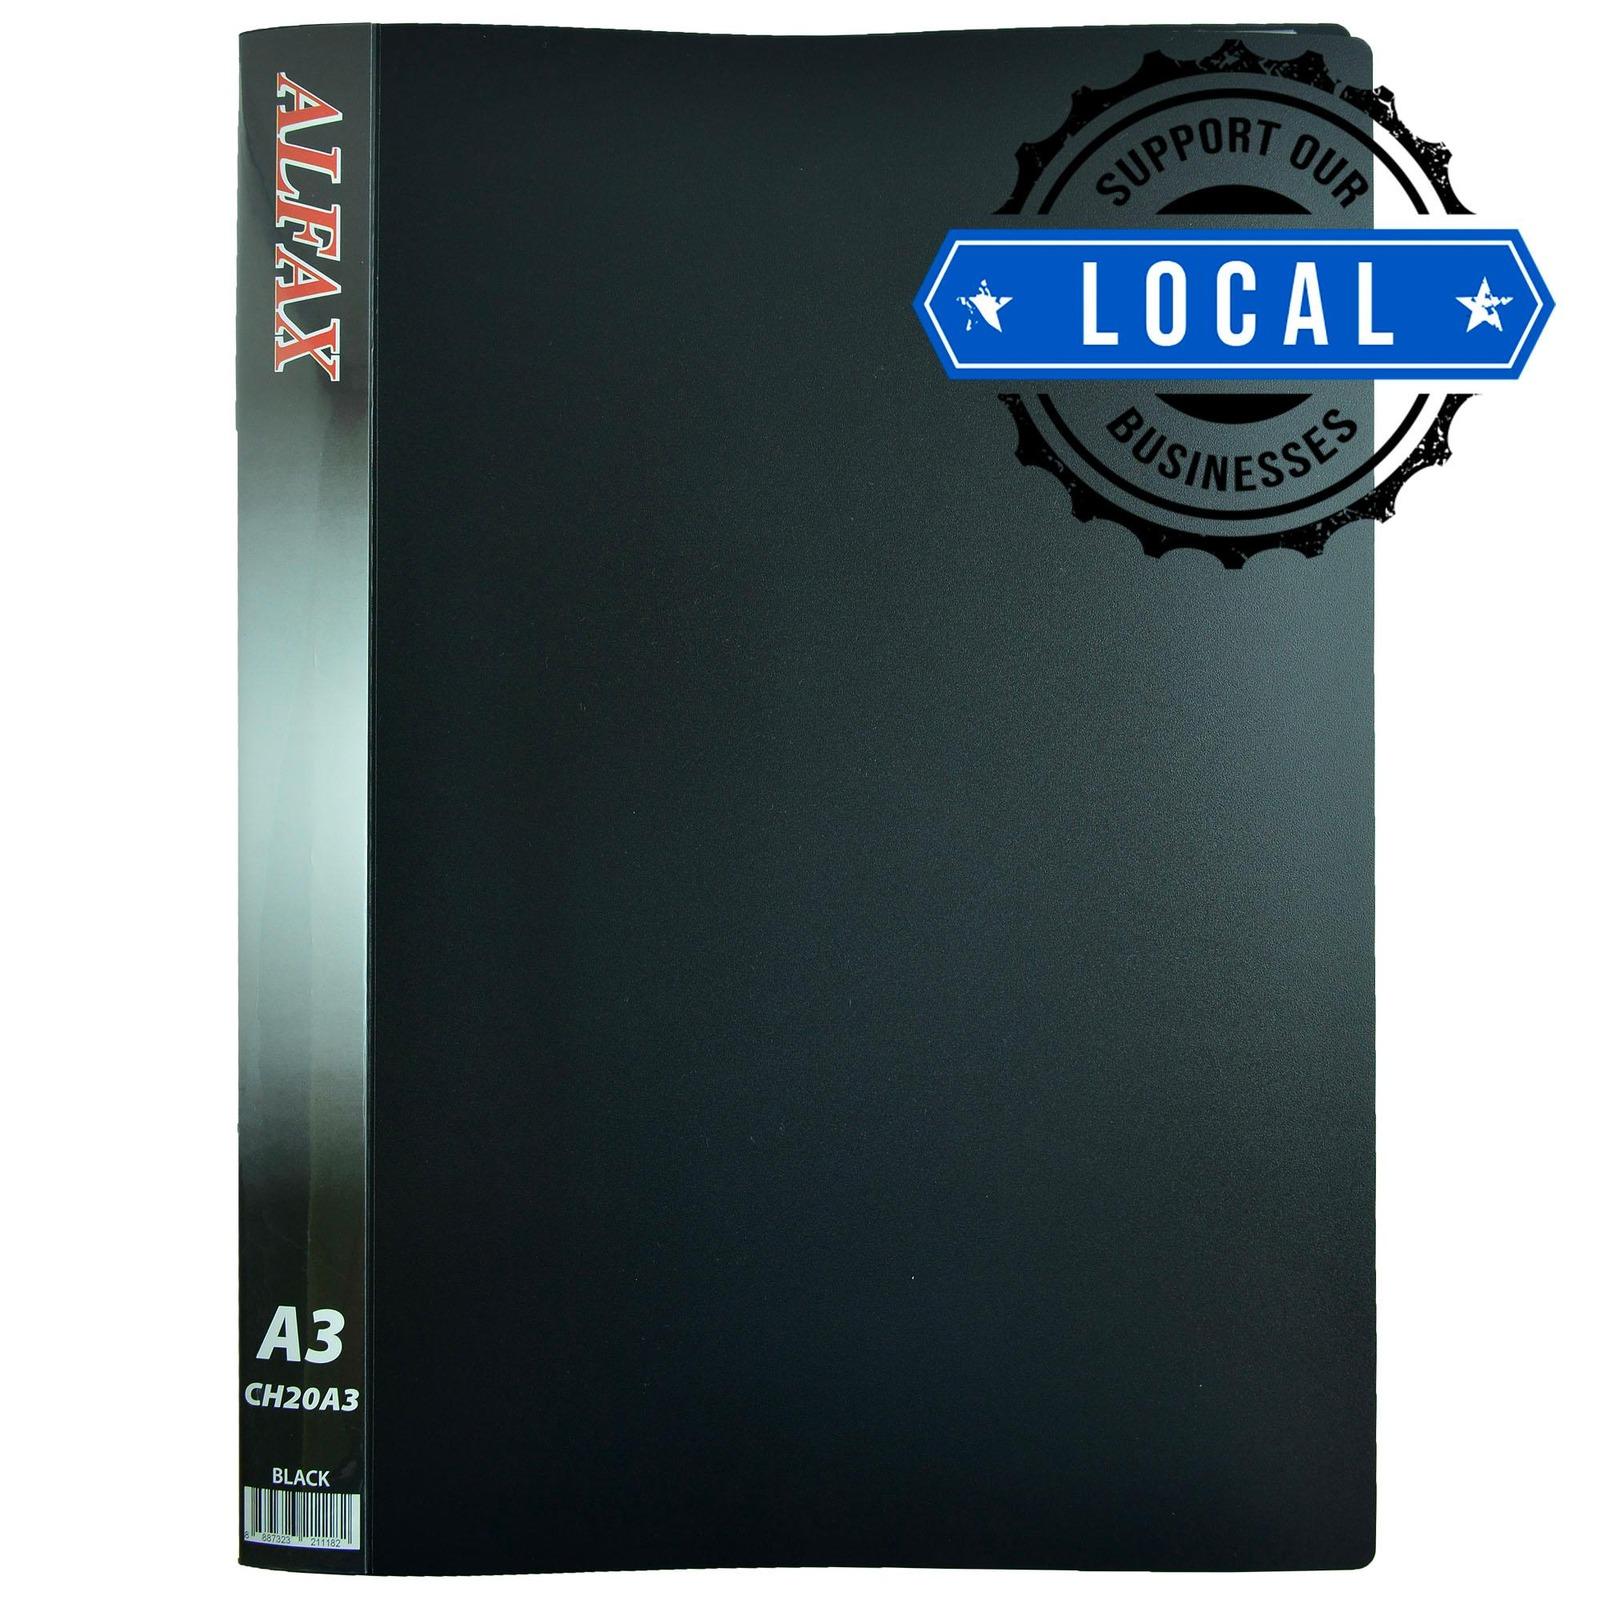 ALFAX CH20A3 Clear Holder 20 Pockets A3 Black